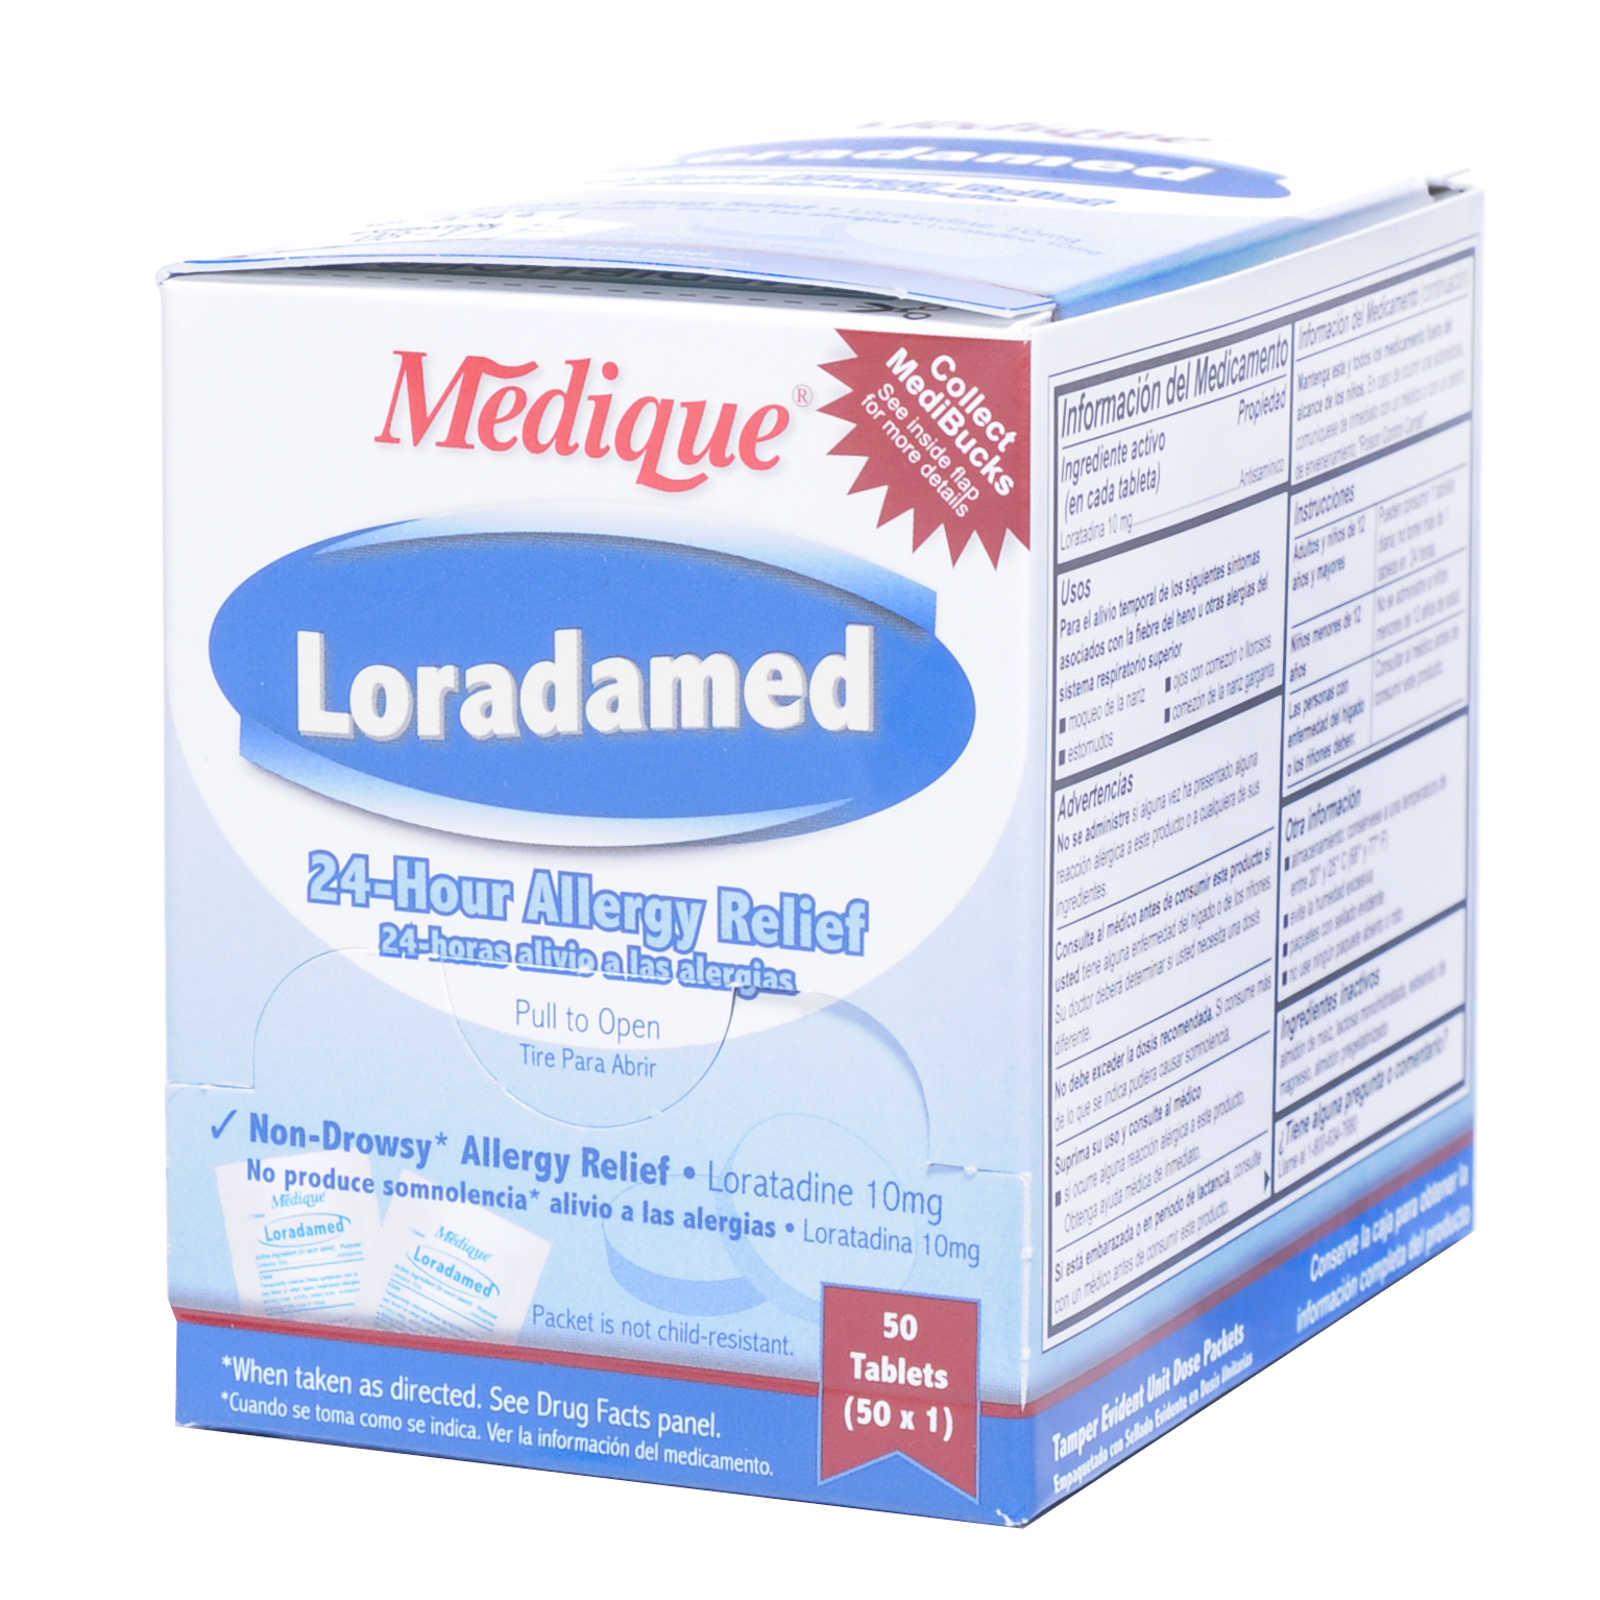 Medique Loradamed Allergy Relief 50x1